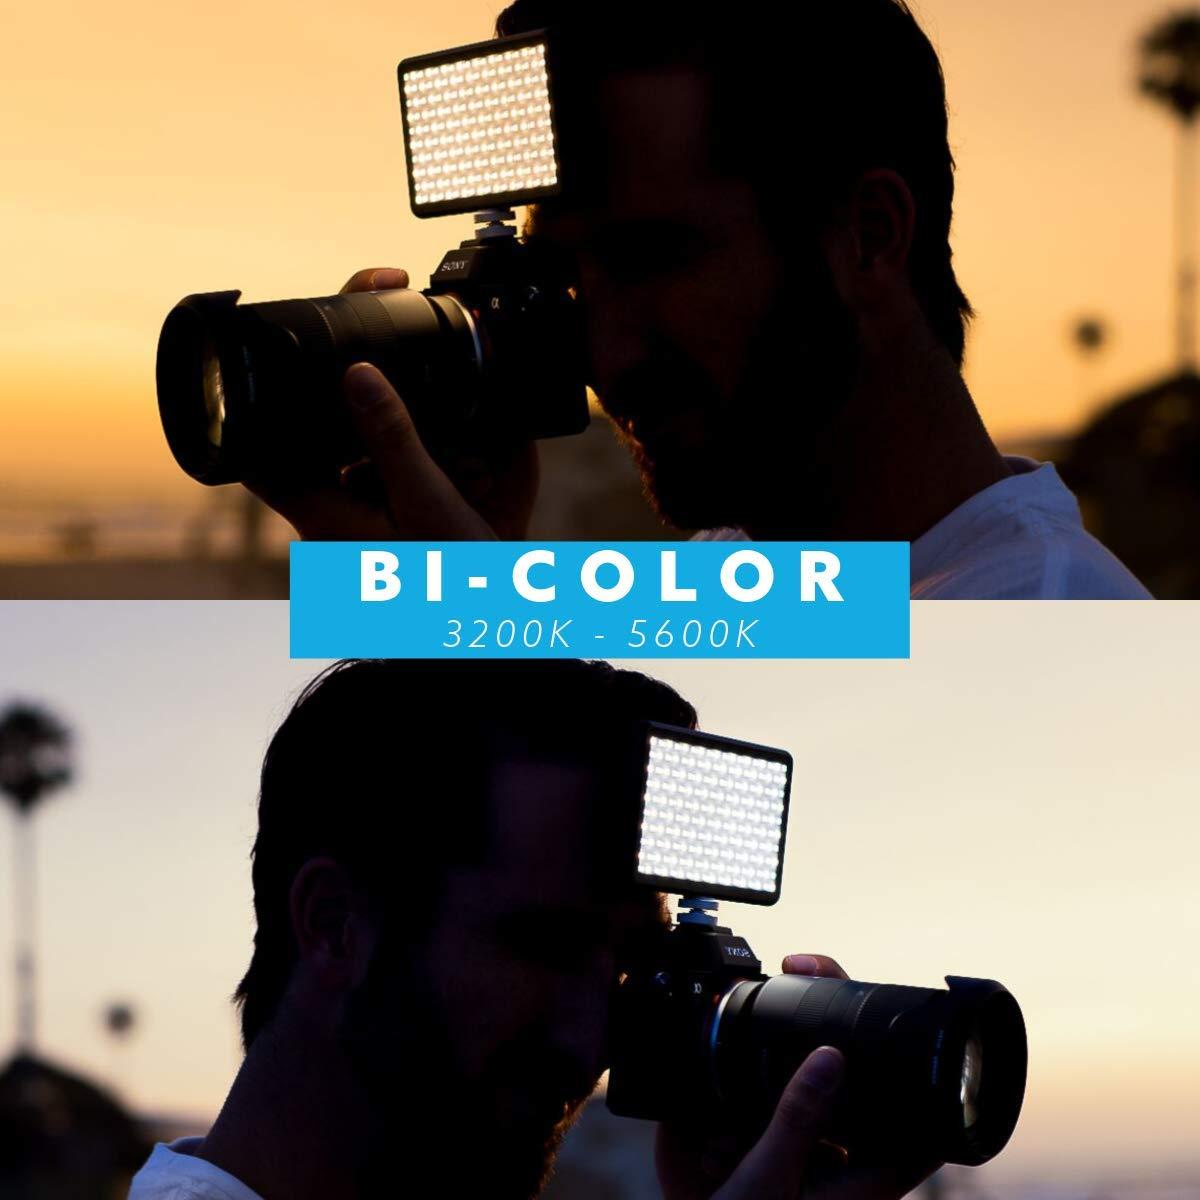 Photo and Video Lighting Nikon Fuji DSLR Ball Head Mount Bicolor Continuous LED Video Light Made for Content Creators Canon Panasonic Fits Sony Lume Cube Panel Mini